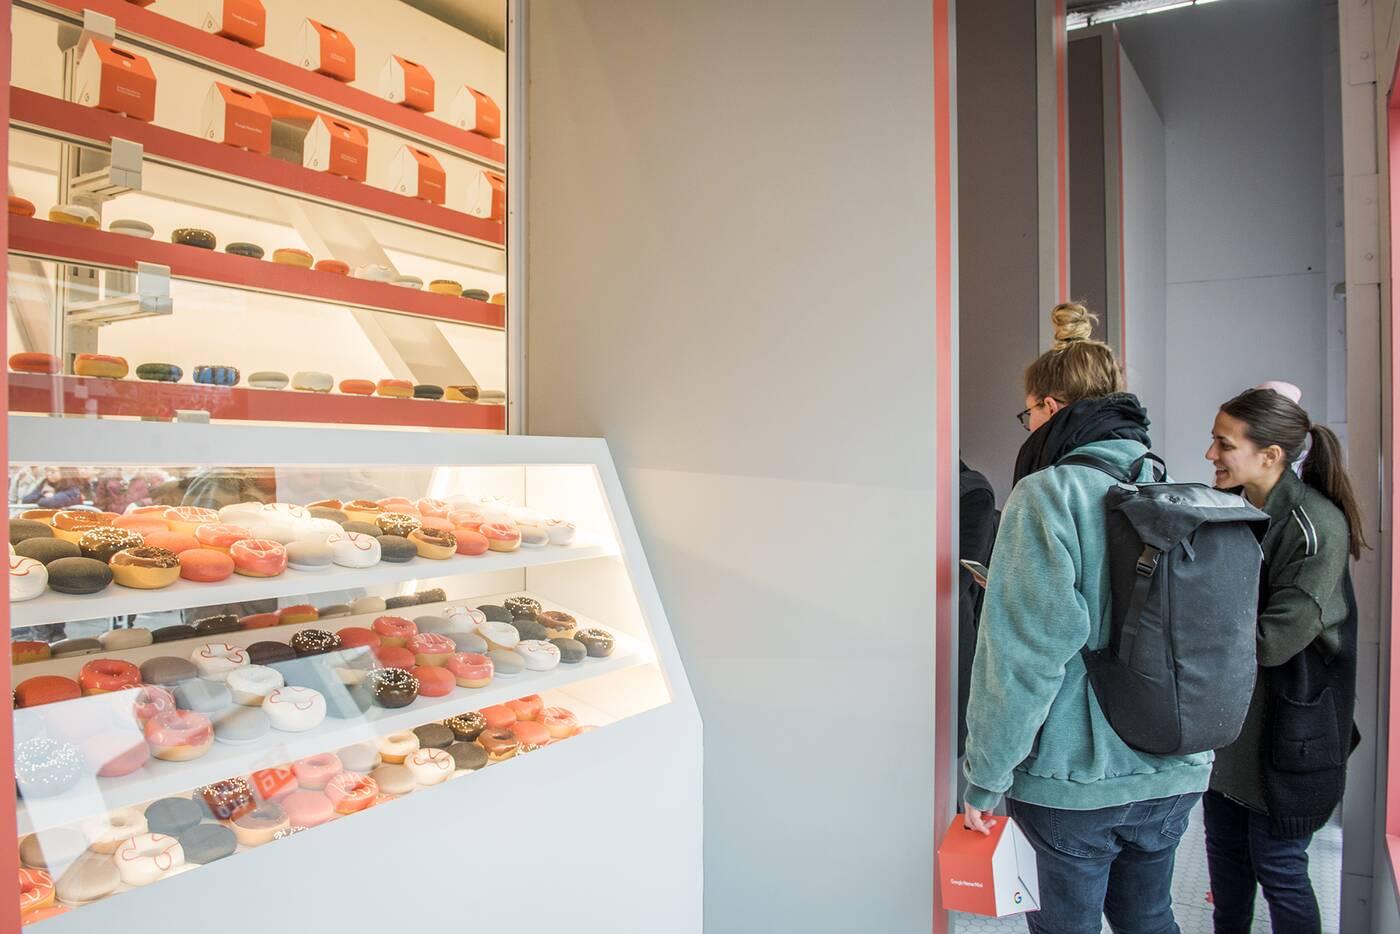 Google Donut shop